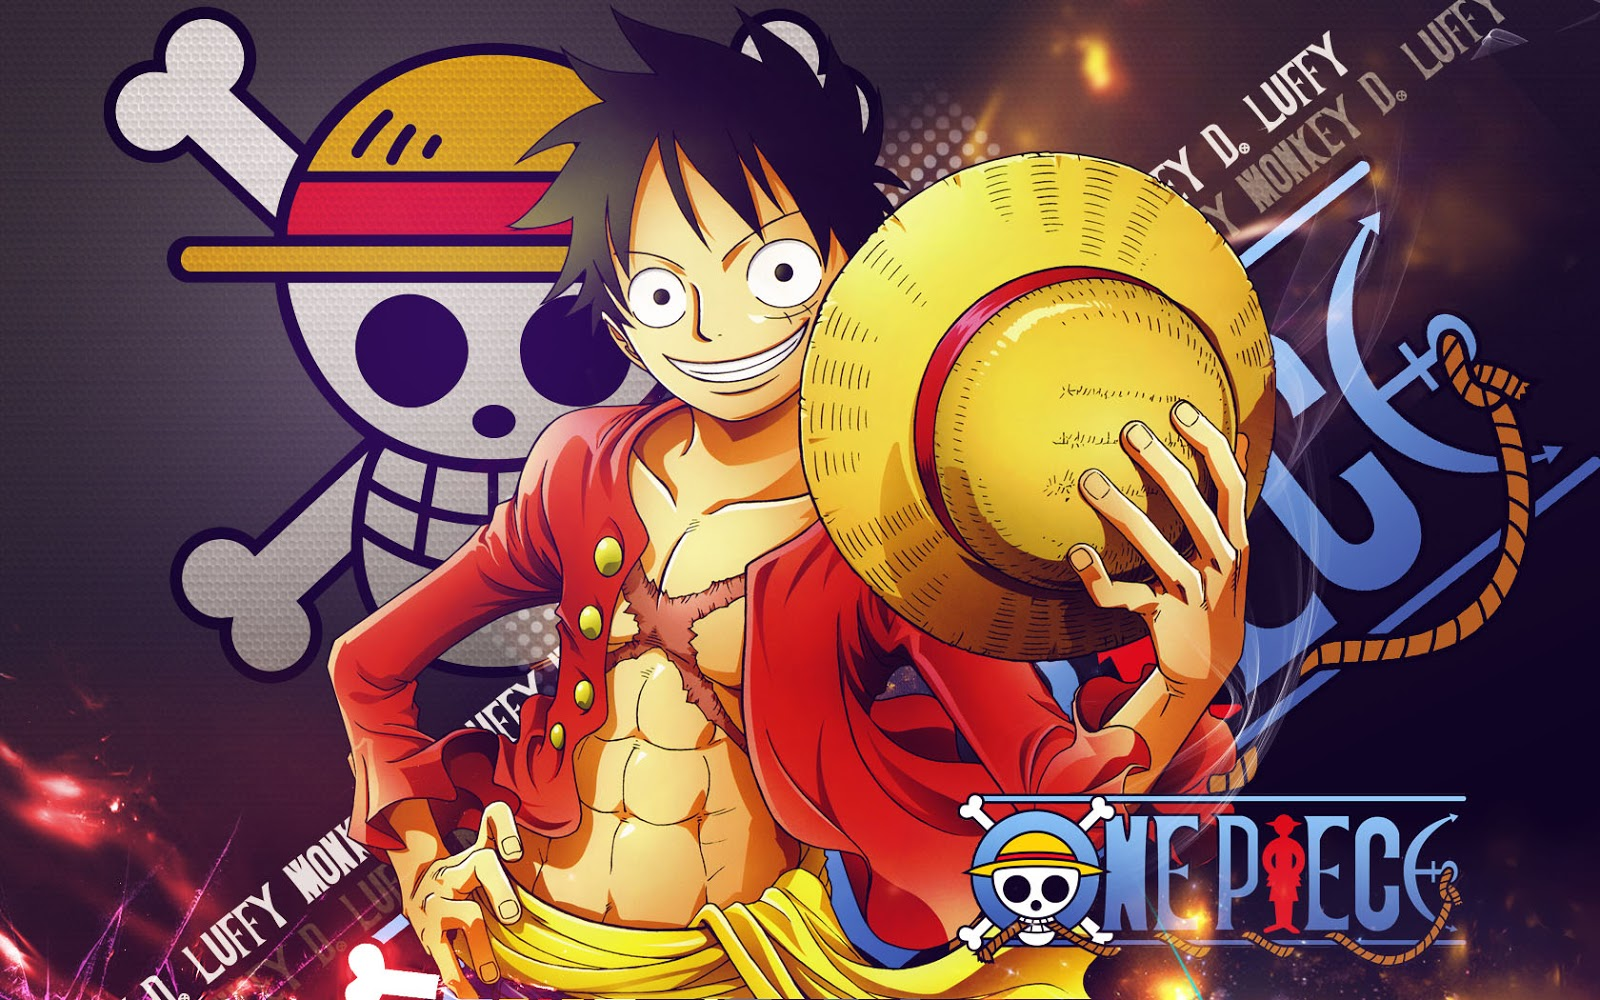 Free Download One Piece New World 2013 Wallpaper Maceme Wallpaper